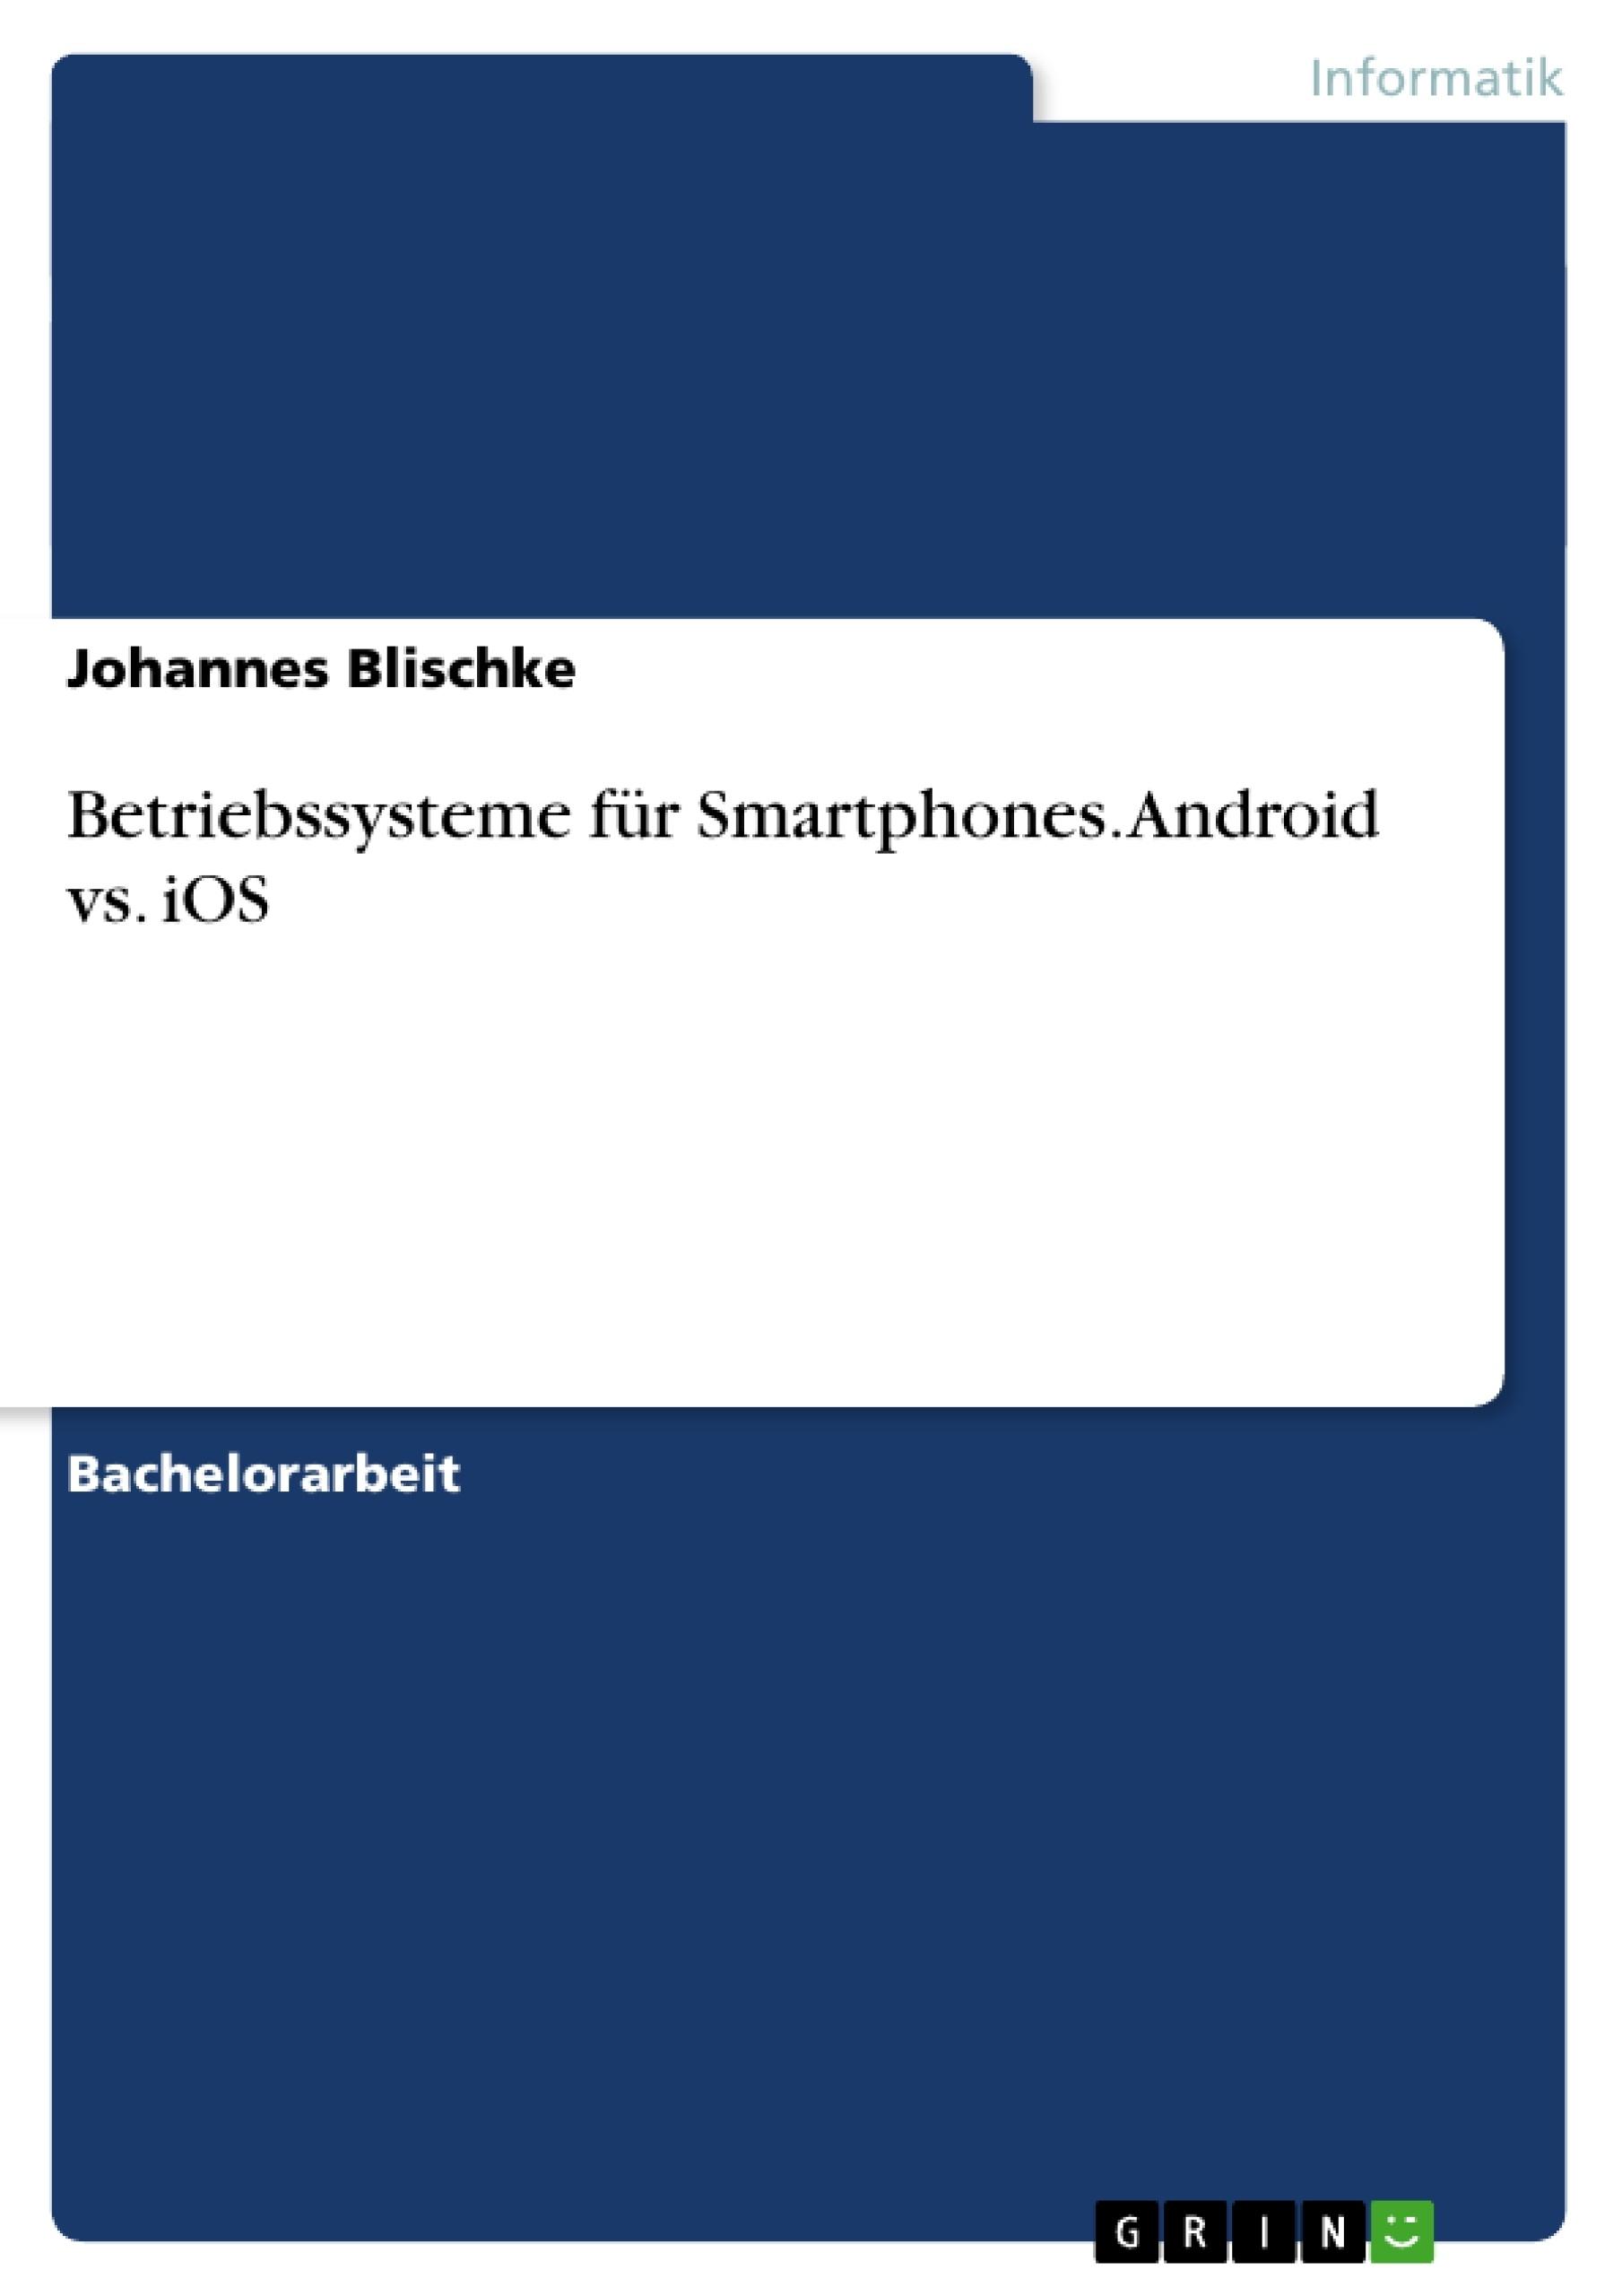 Titel: Betriebssysteme für Smartphones. Android vs. iOS